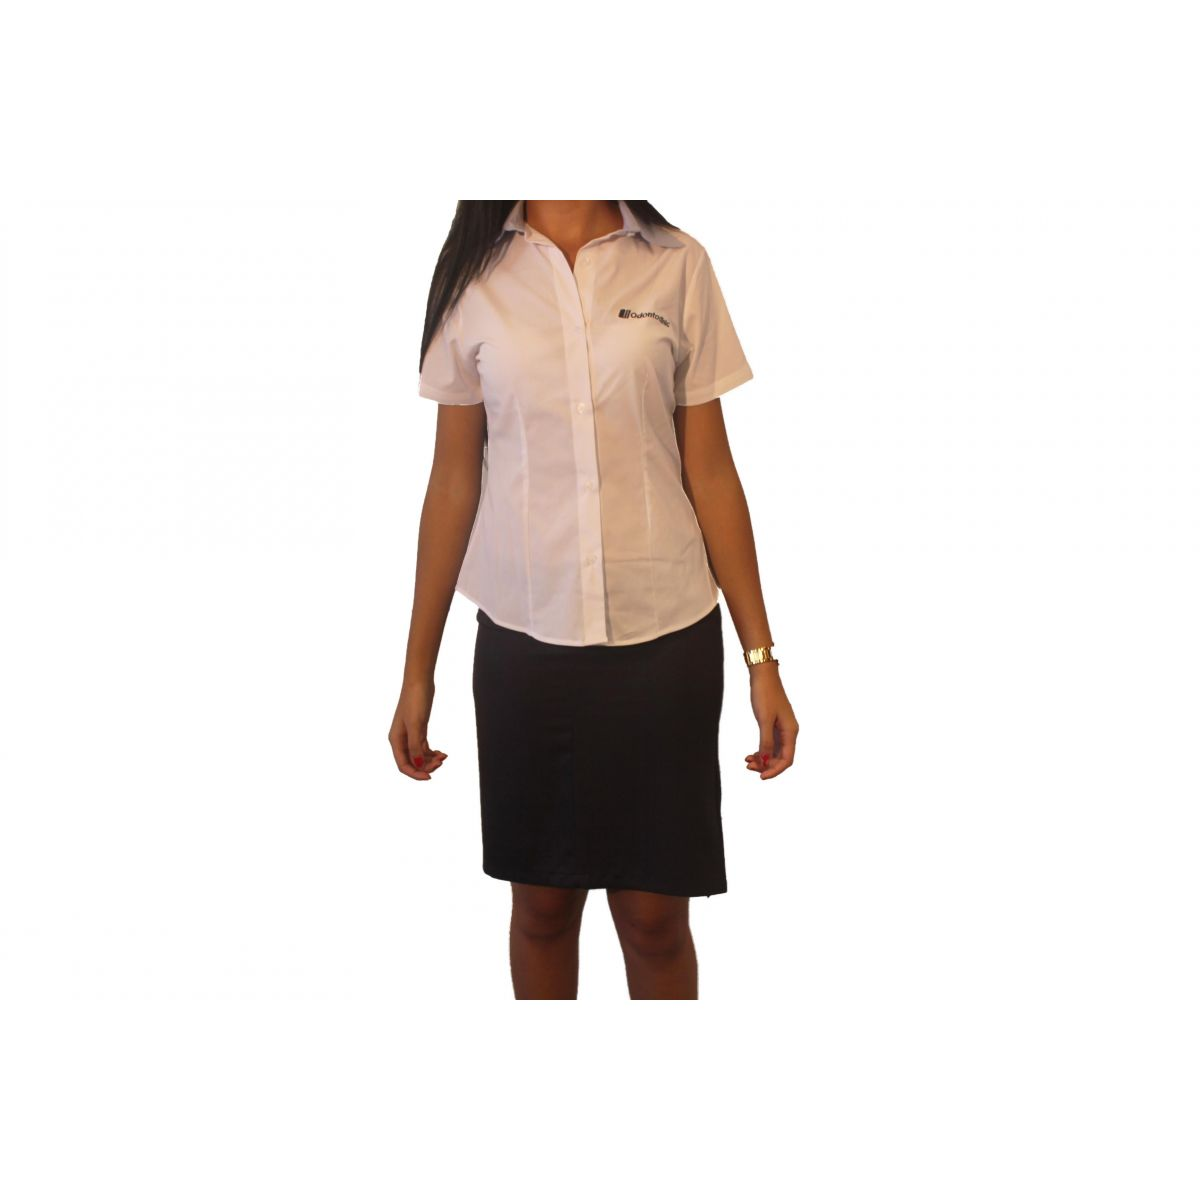 Camisa Social Feminina Manga Curta  - Uniformes Odontoclinic